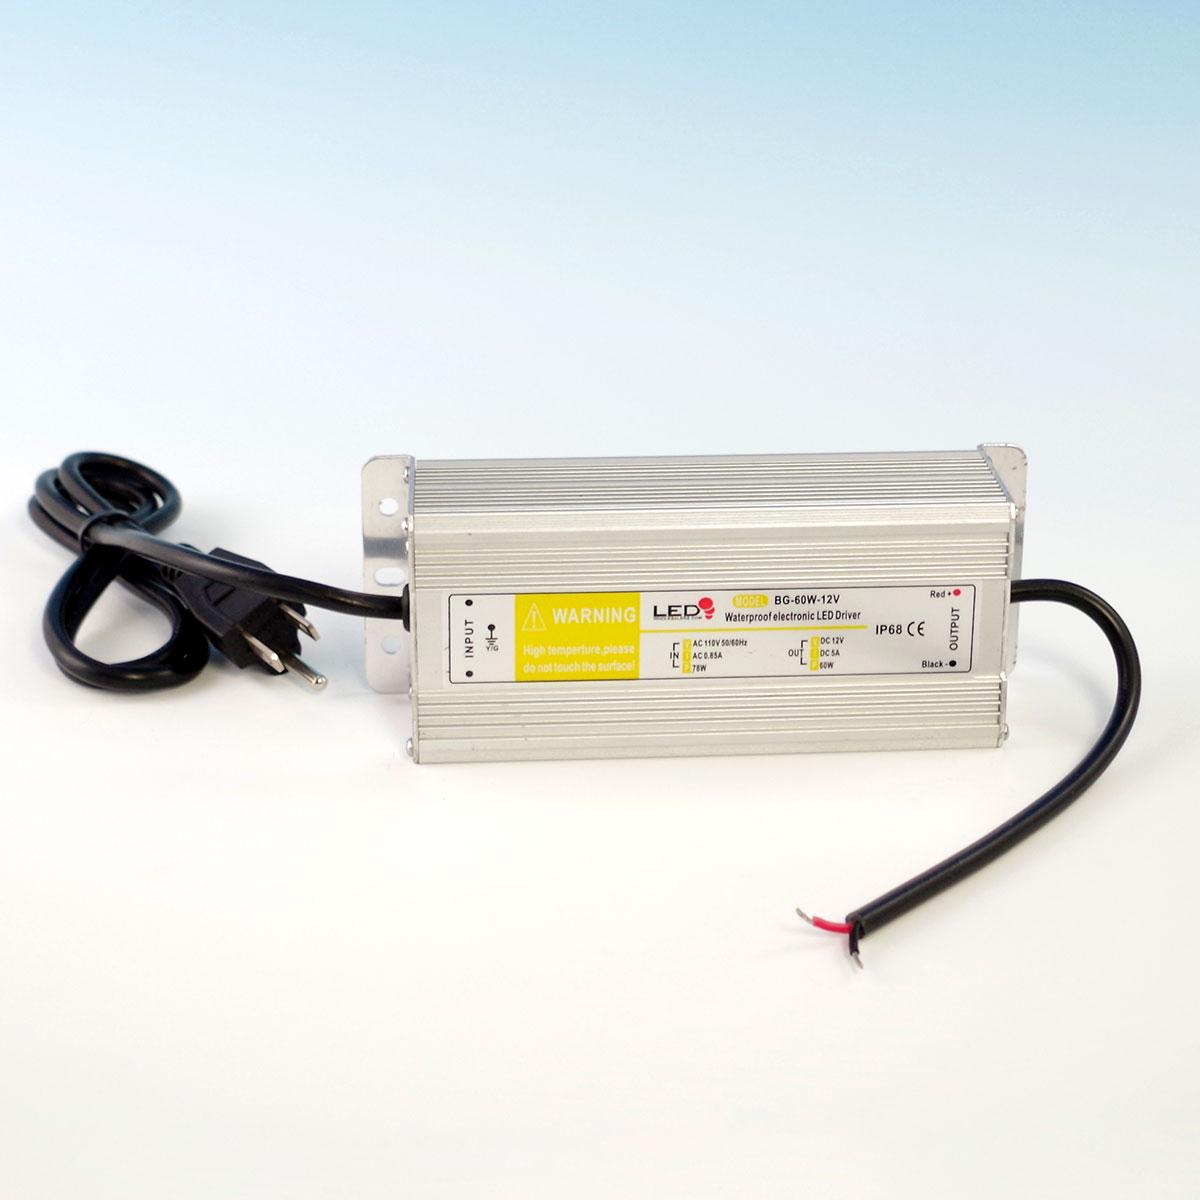 Contractor Grade LED Transformer by DecksDirect-60 watt